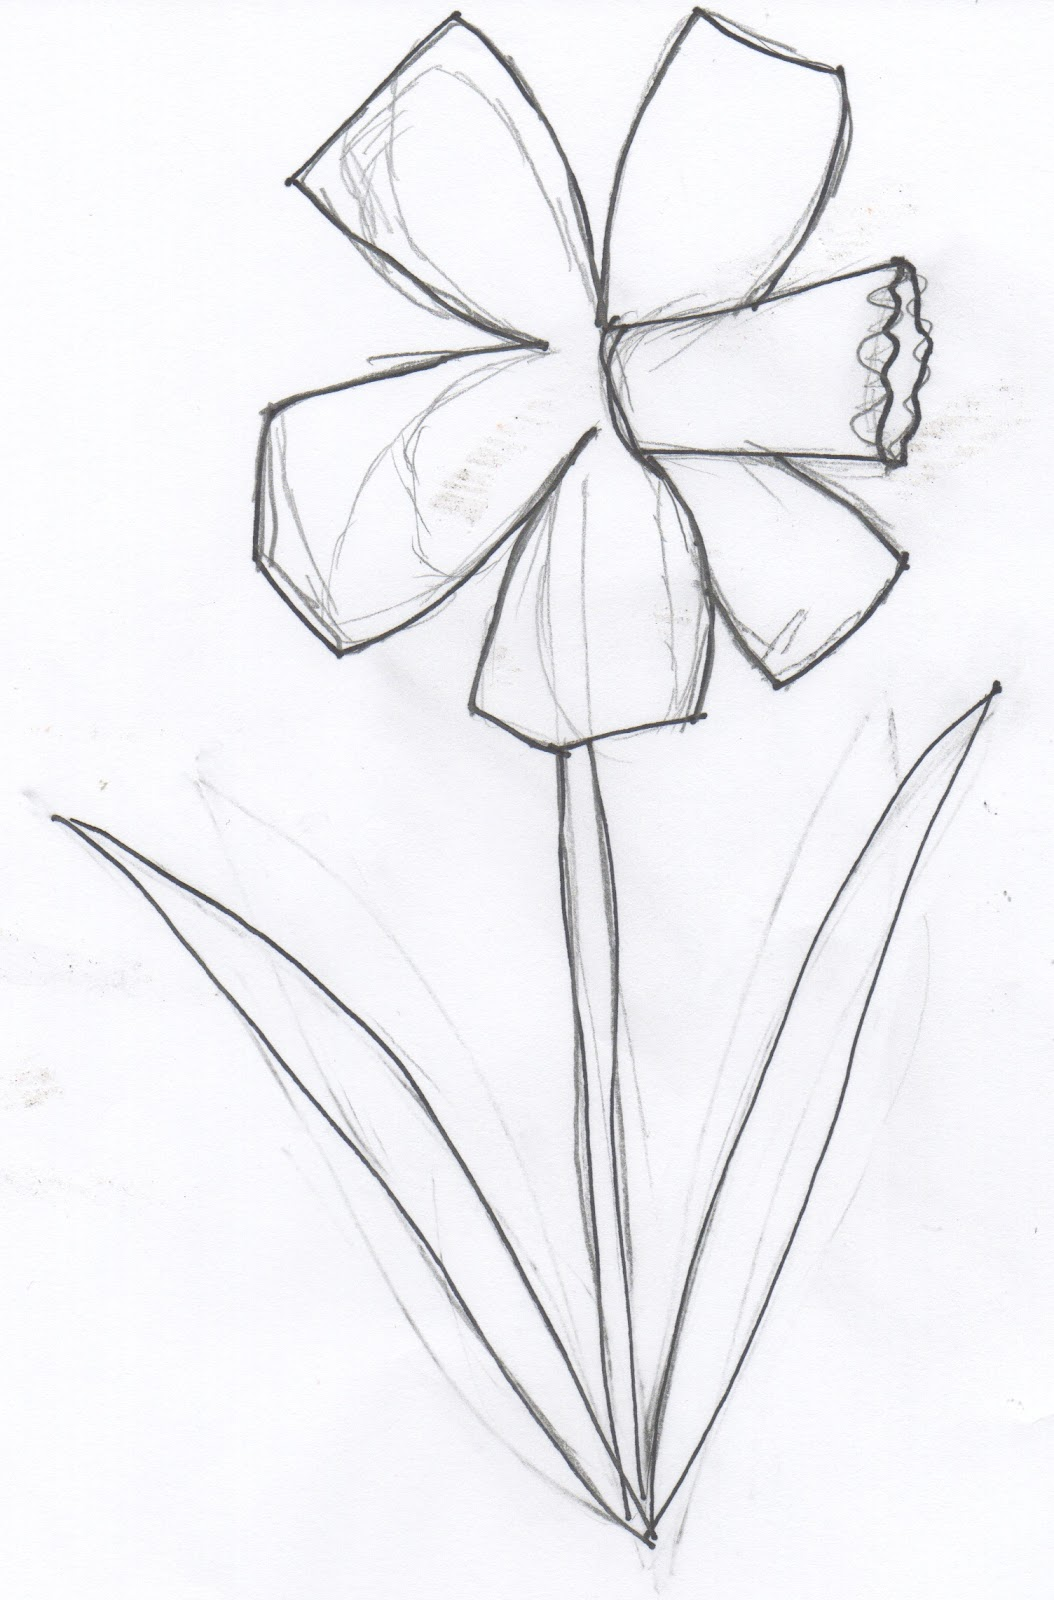 645 workshop by the crafty cpa return on creativity daffodil pillow